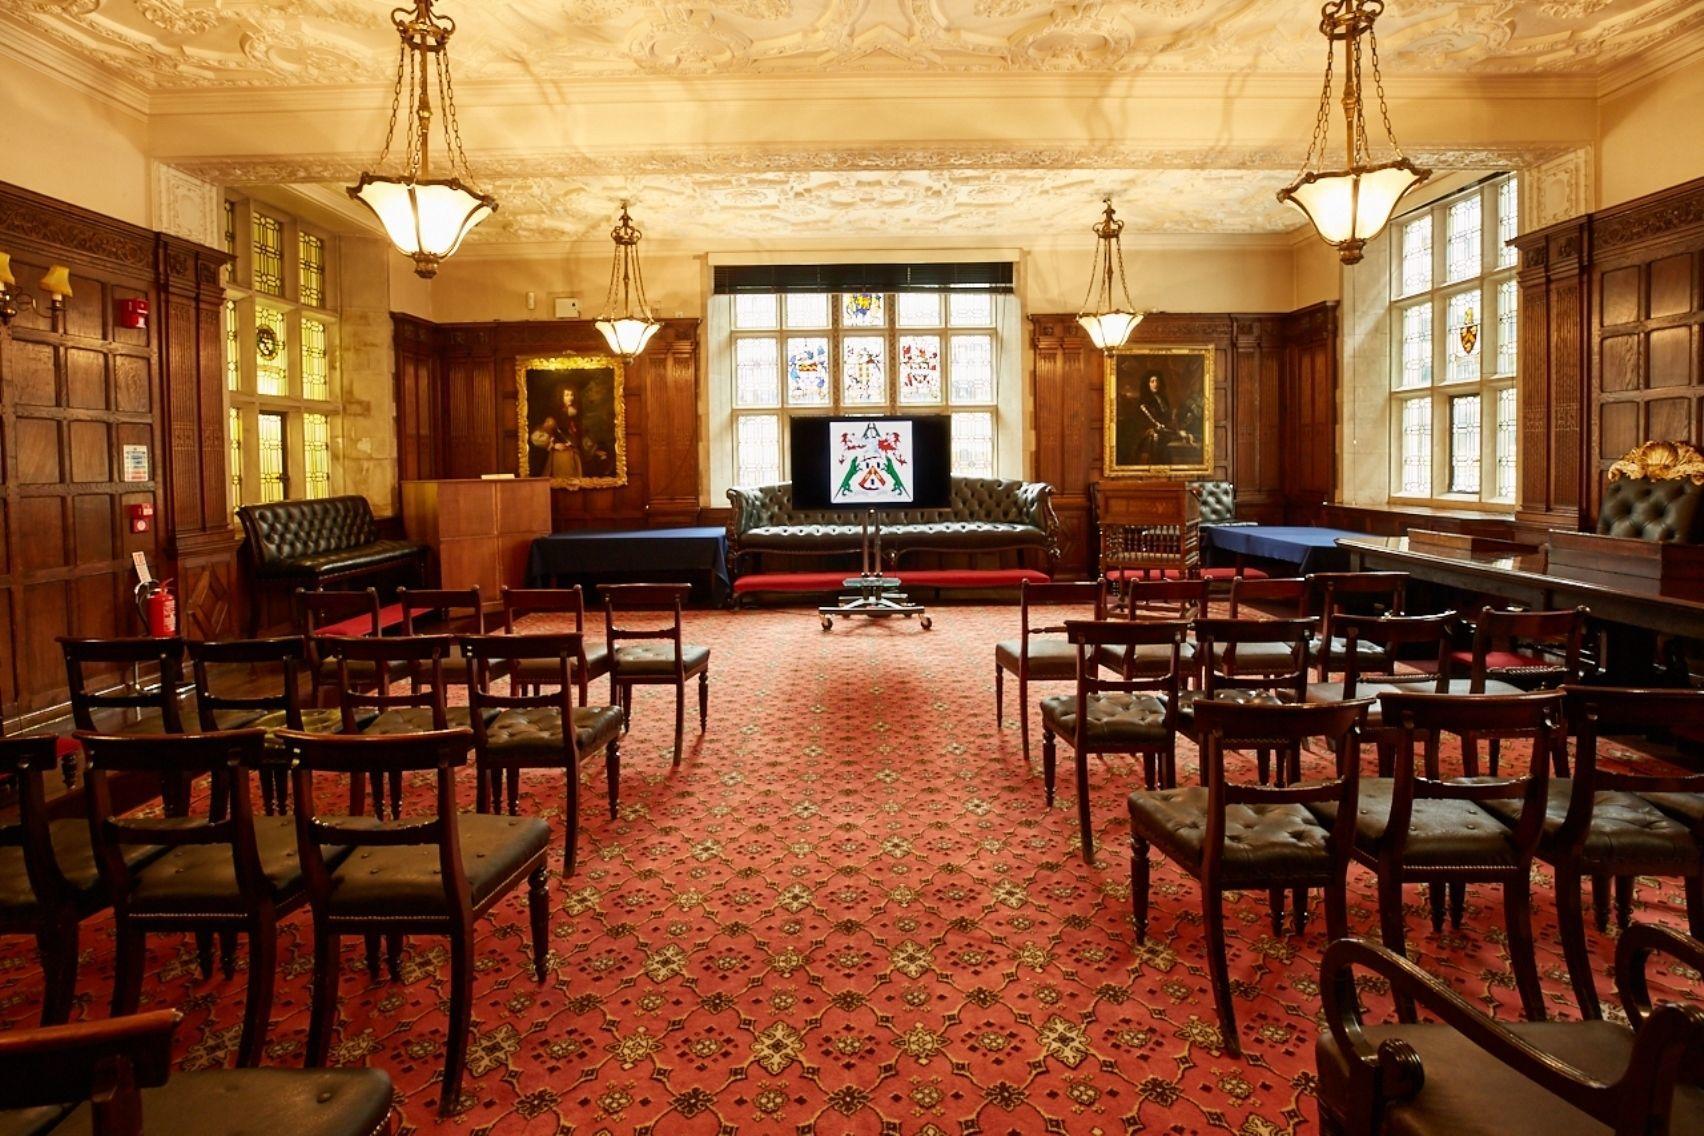 Court Room and Luncheon Room, Ironmongers Hall